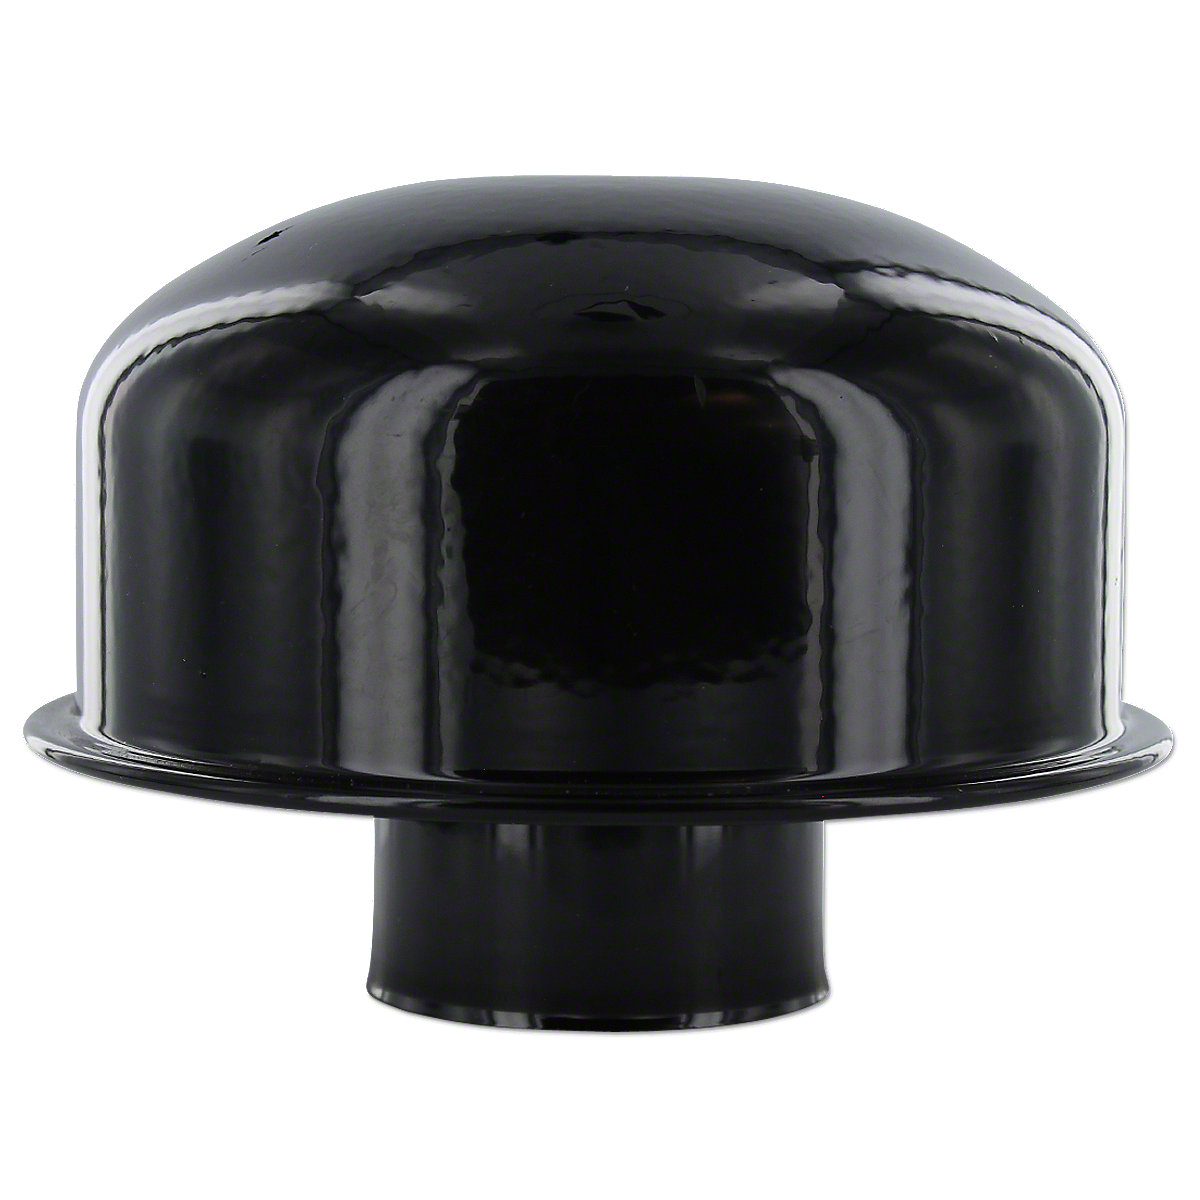 Air Cleaner Cap For Allis Chalmers: D17, D19.